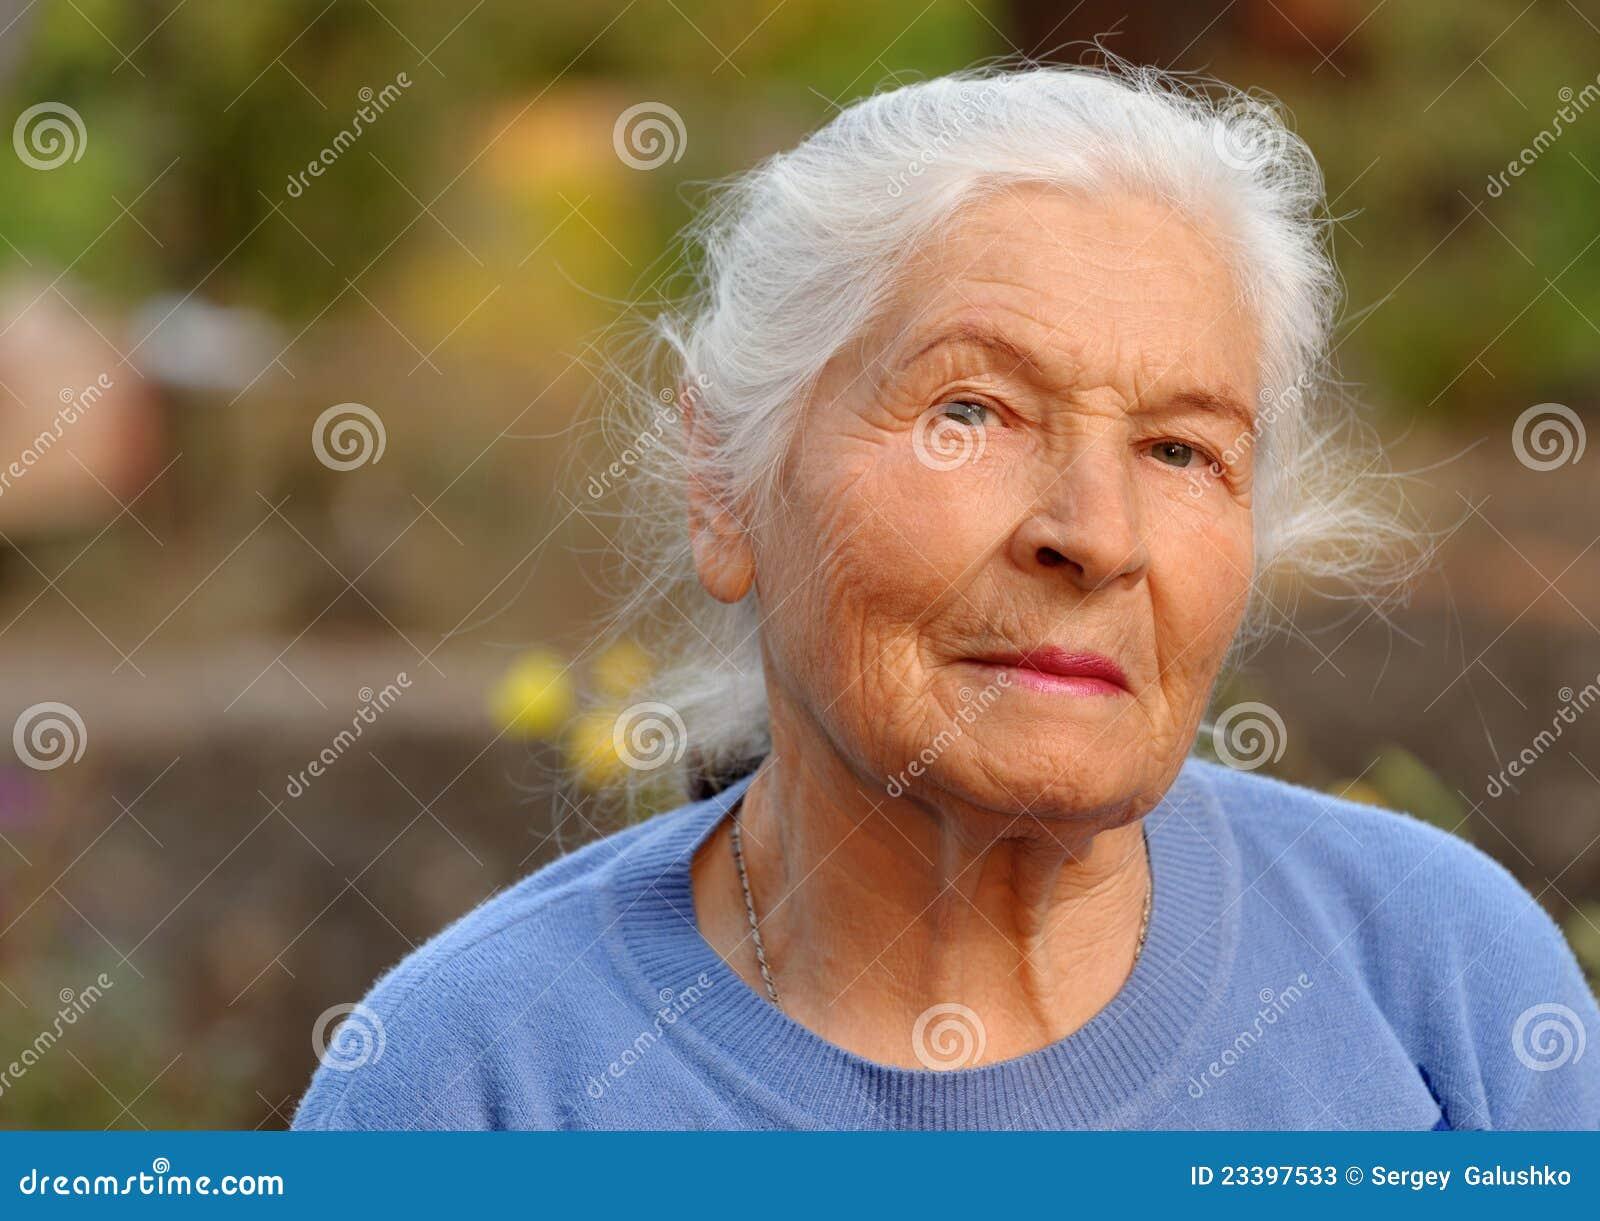 Portrait Of The Elderly Woman Stock Photos - Image: 23397533